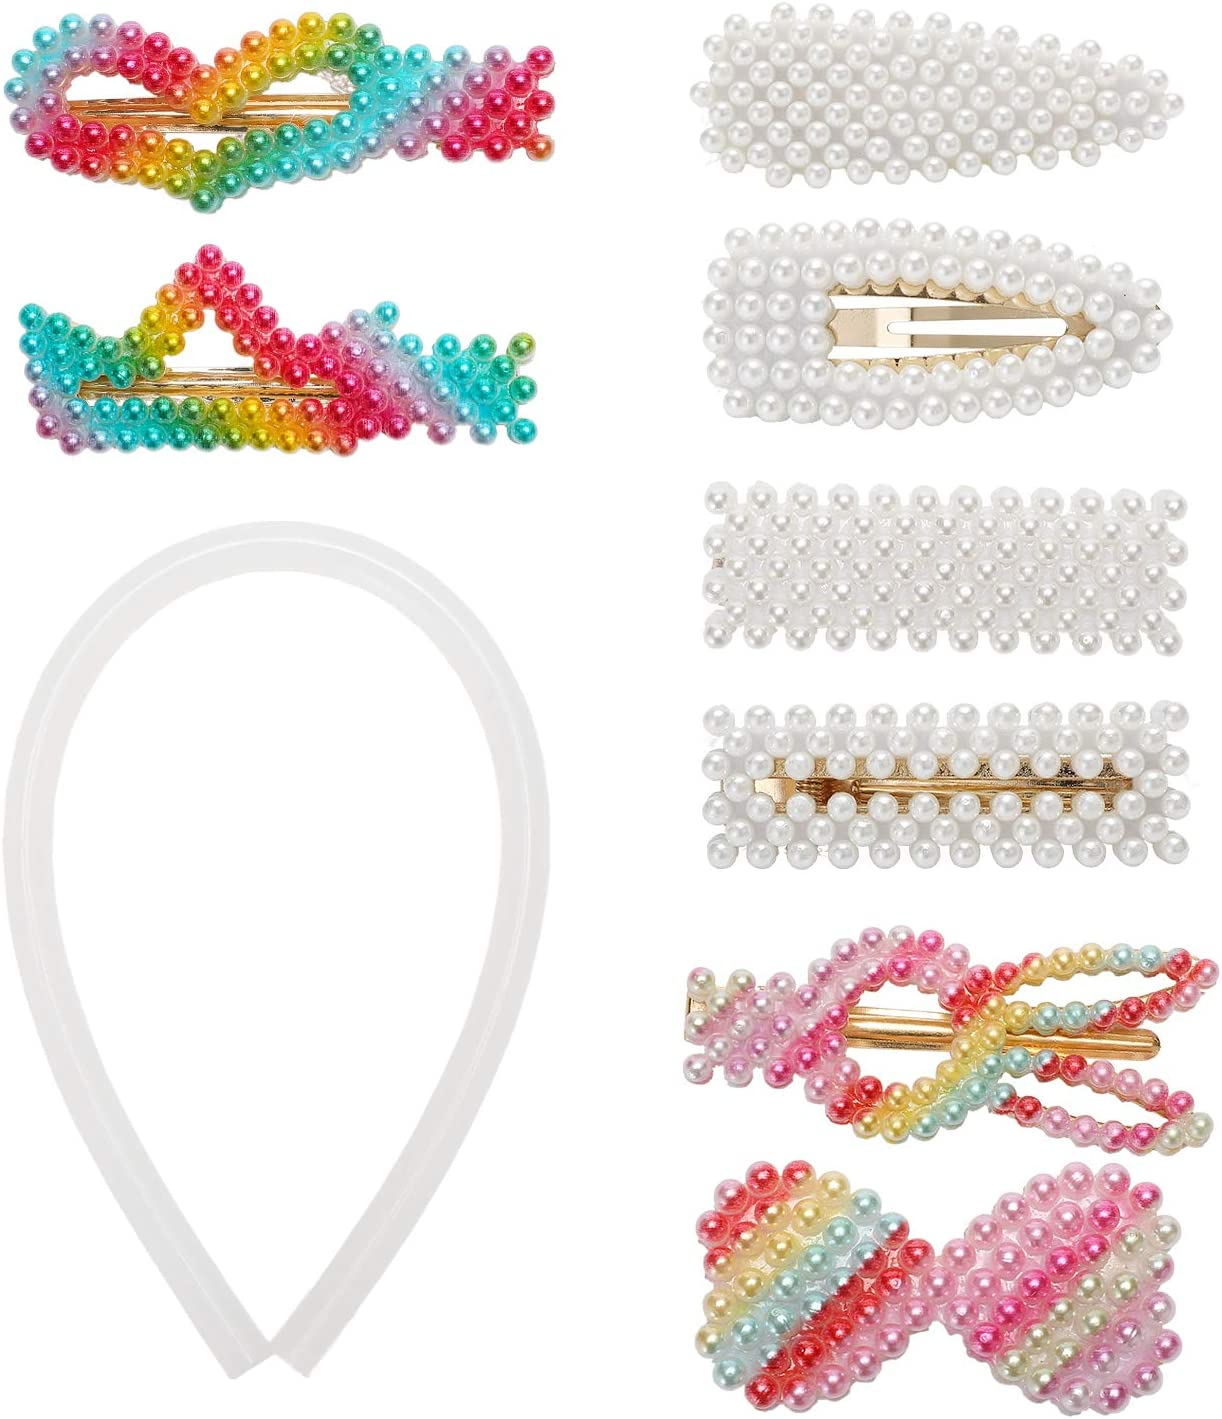 AKIMO 8Pcs Pinzas de pelo de perlas coloridas para mujeres Señoras Niñas Niño Bebé - Se ofrece 1 bastón de pegamento caliente, perfecto para fiestas, bodas, cumpleaños, San Valentín